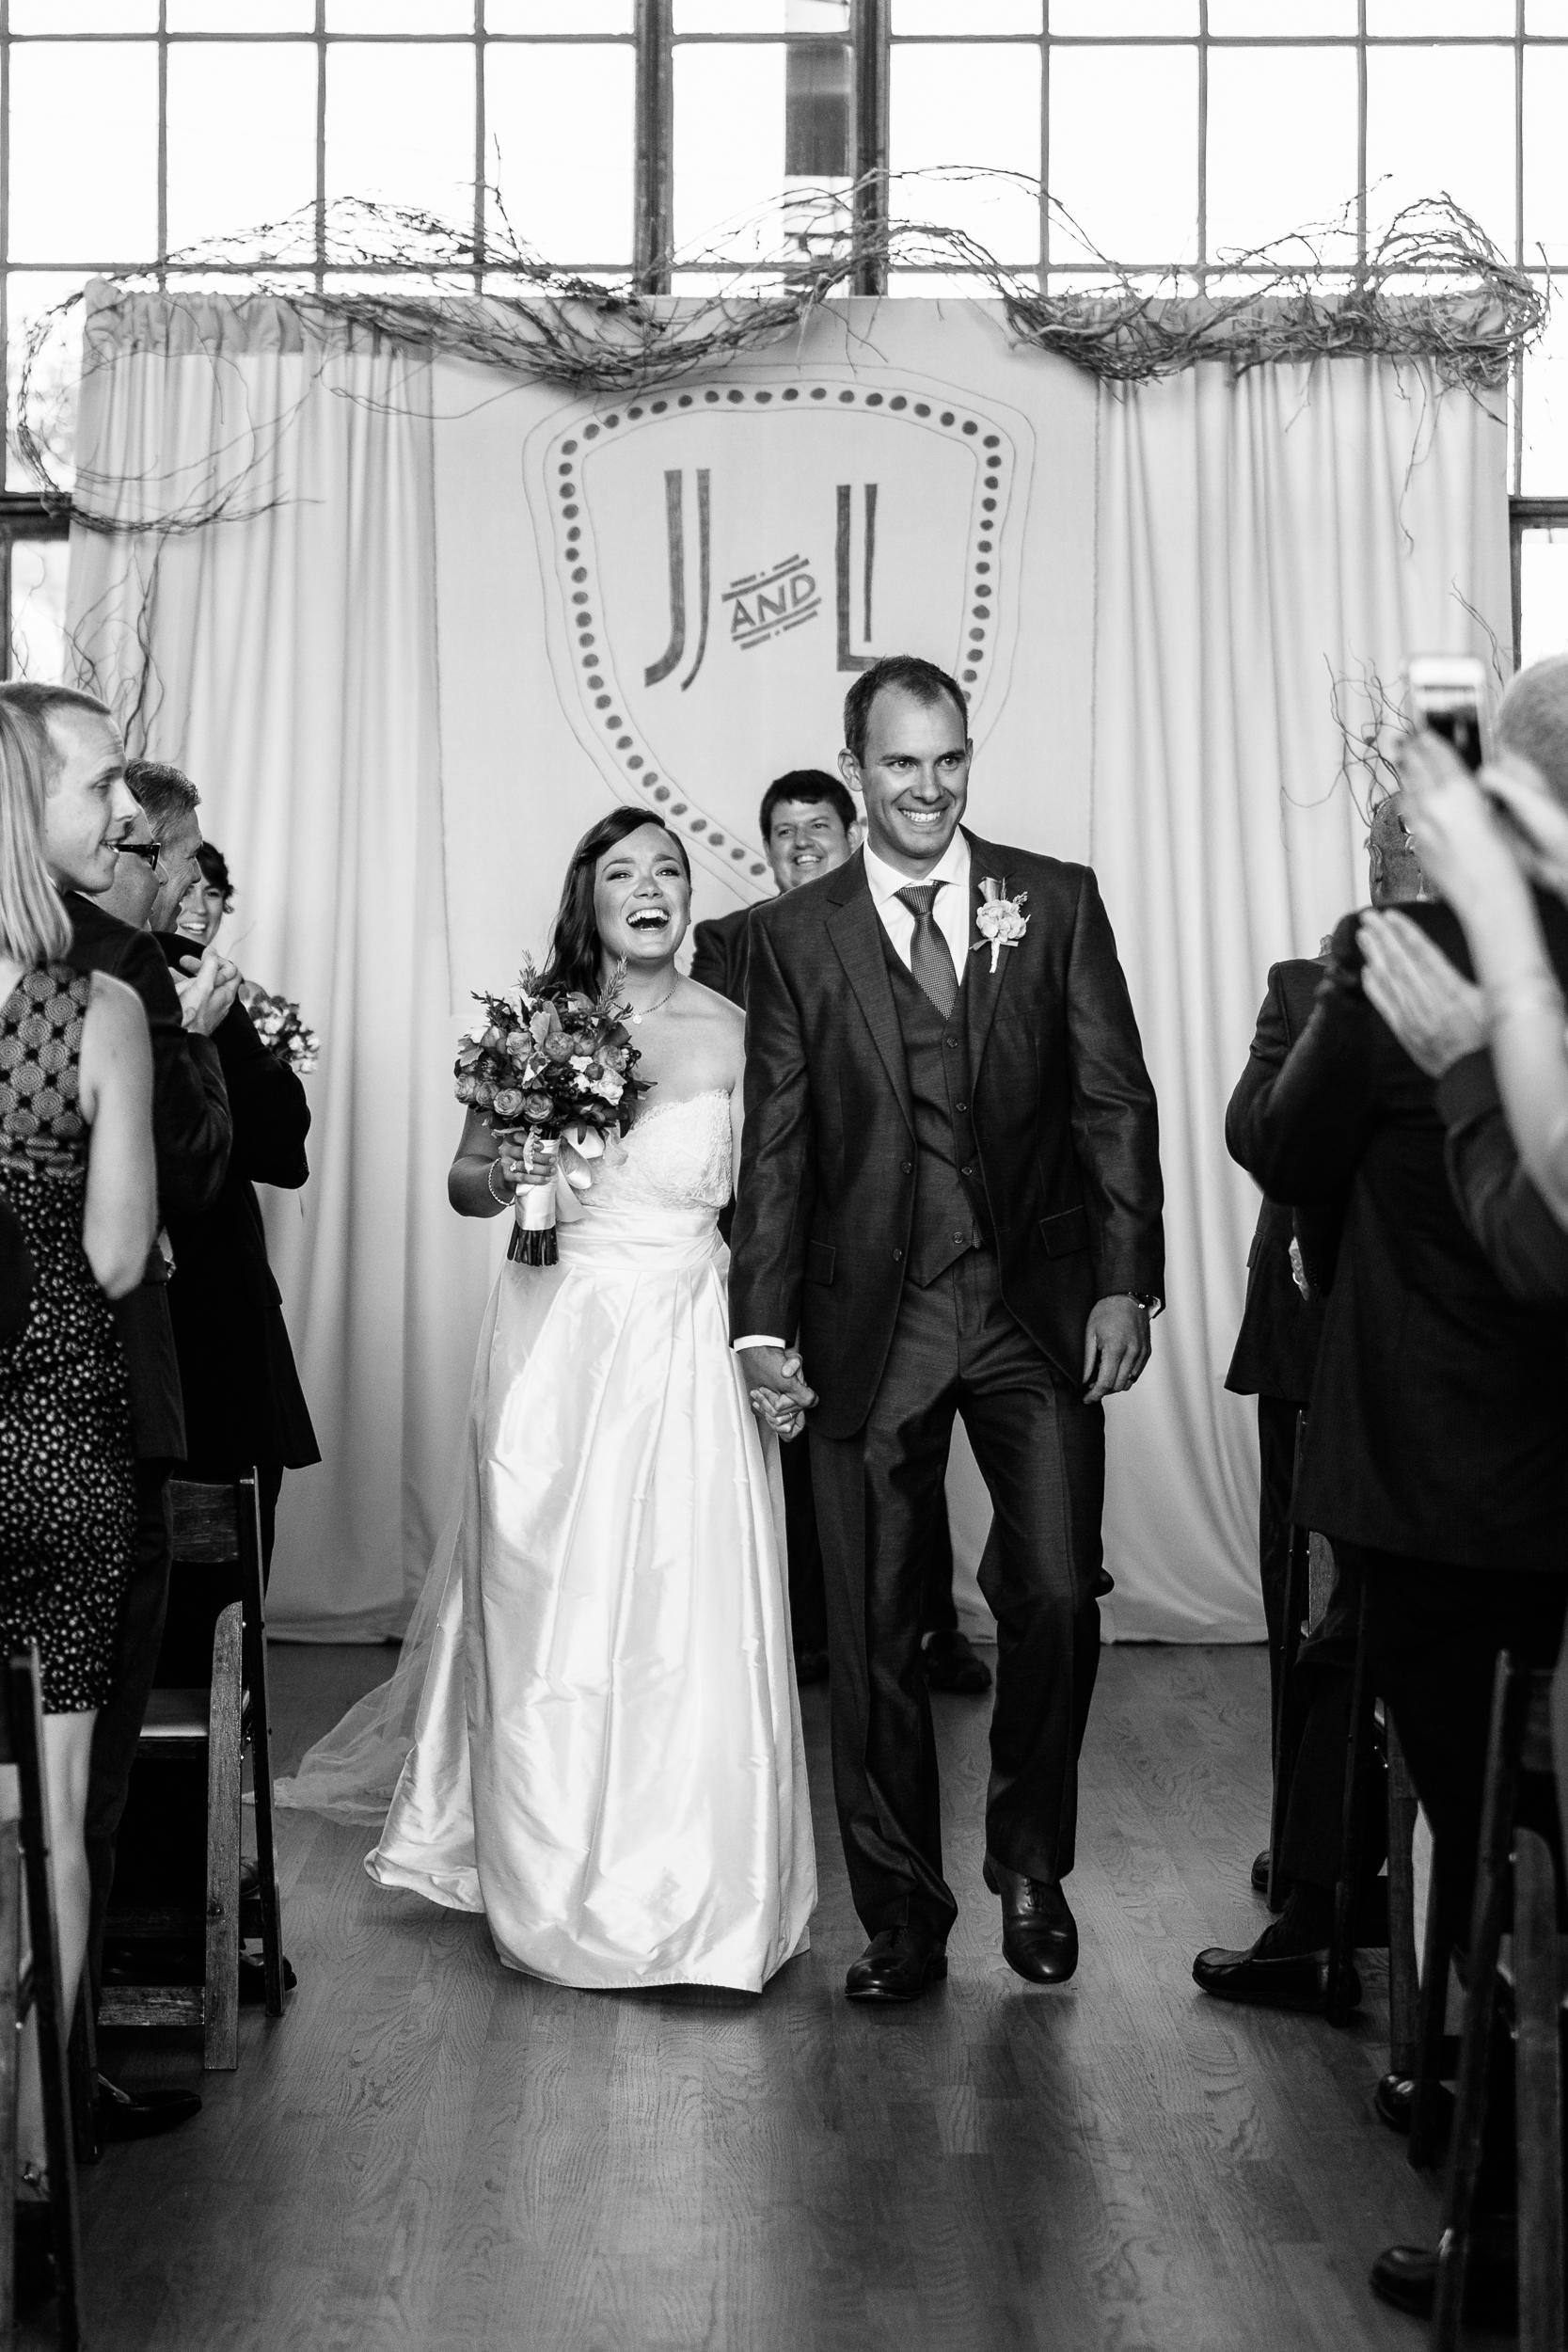 KarliCadel-Wedding-LaurenJake-619.jpg